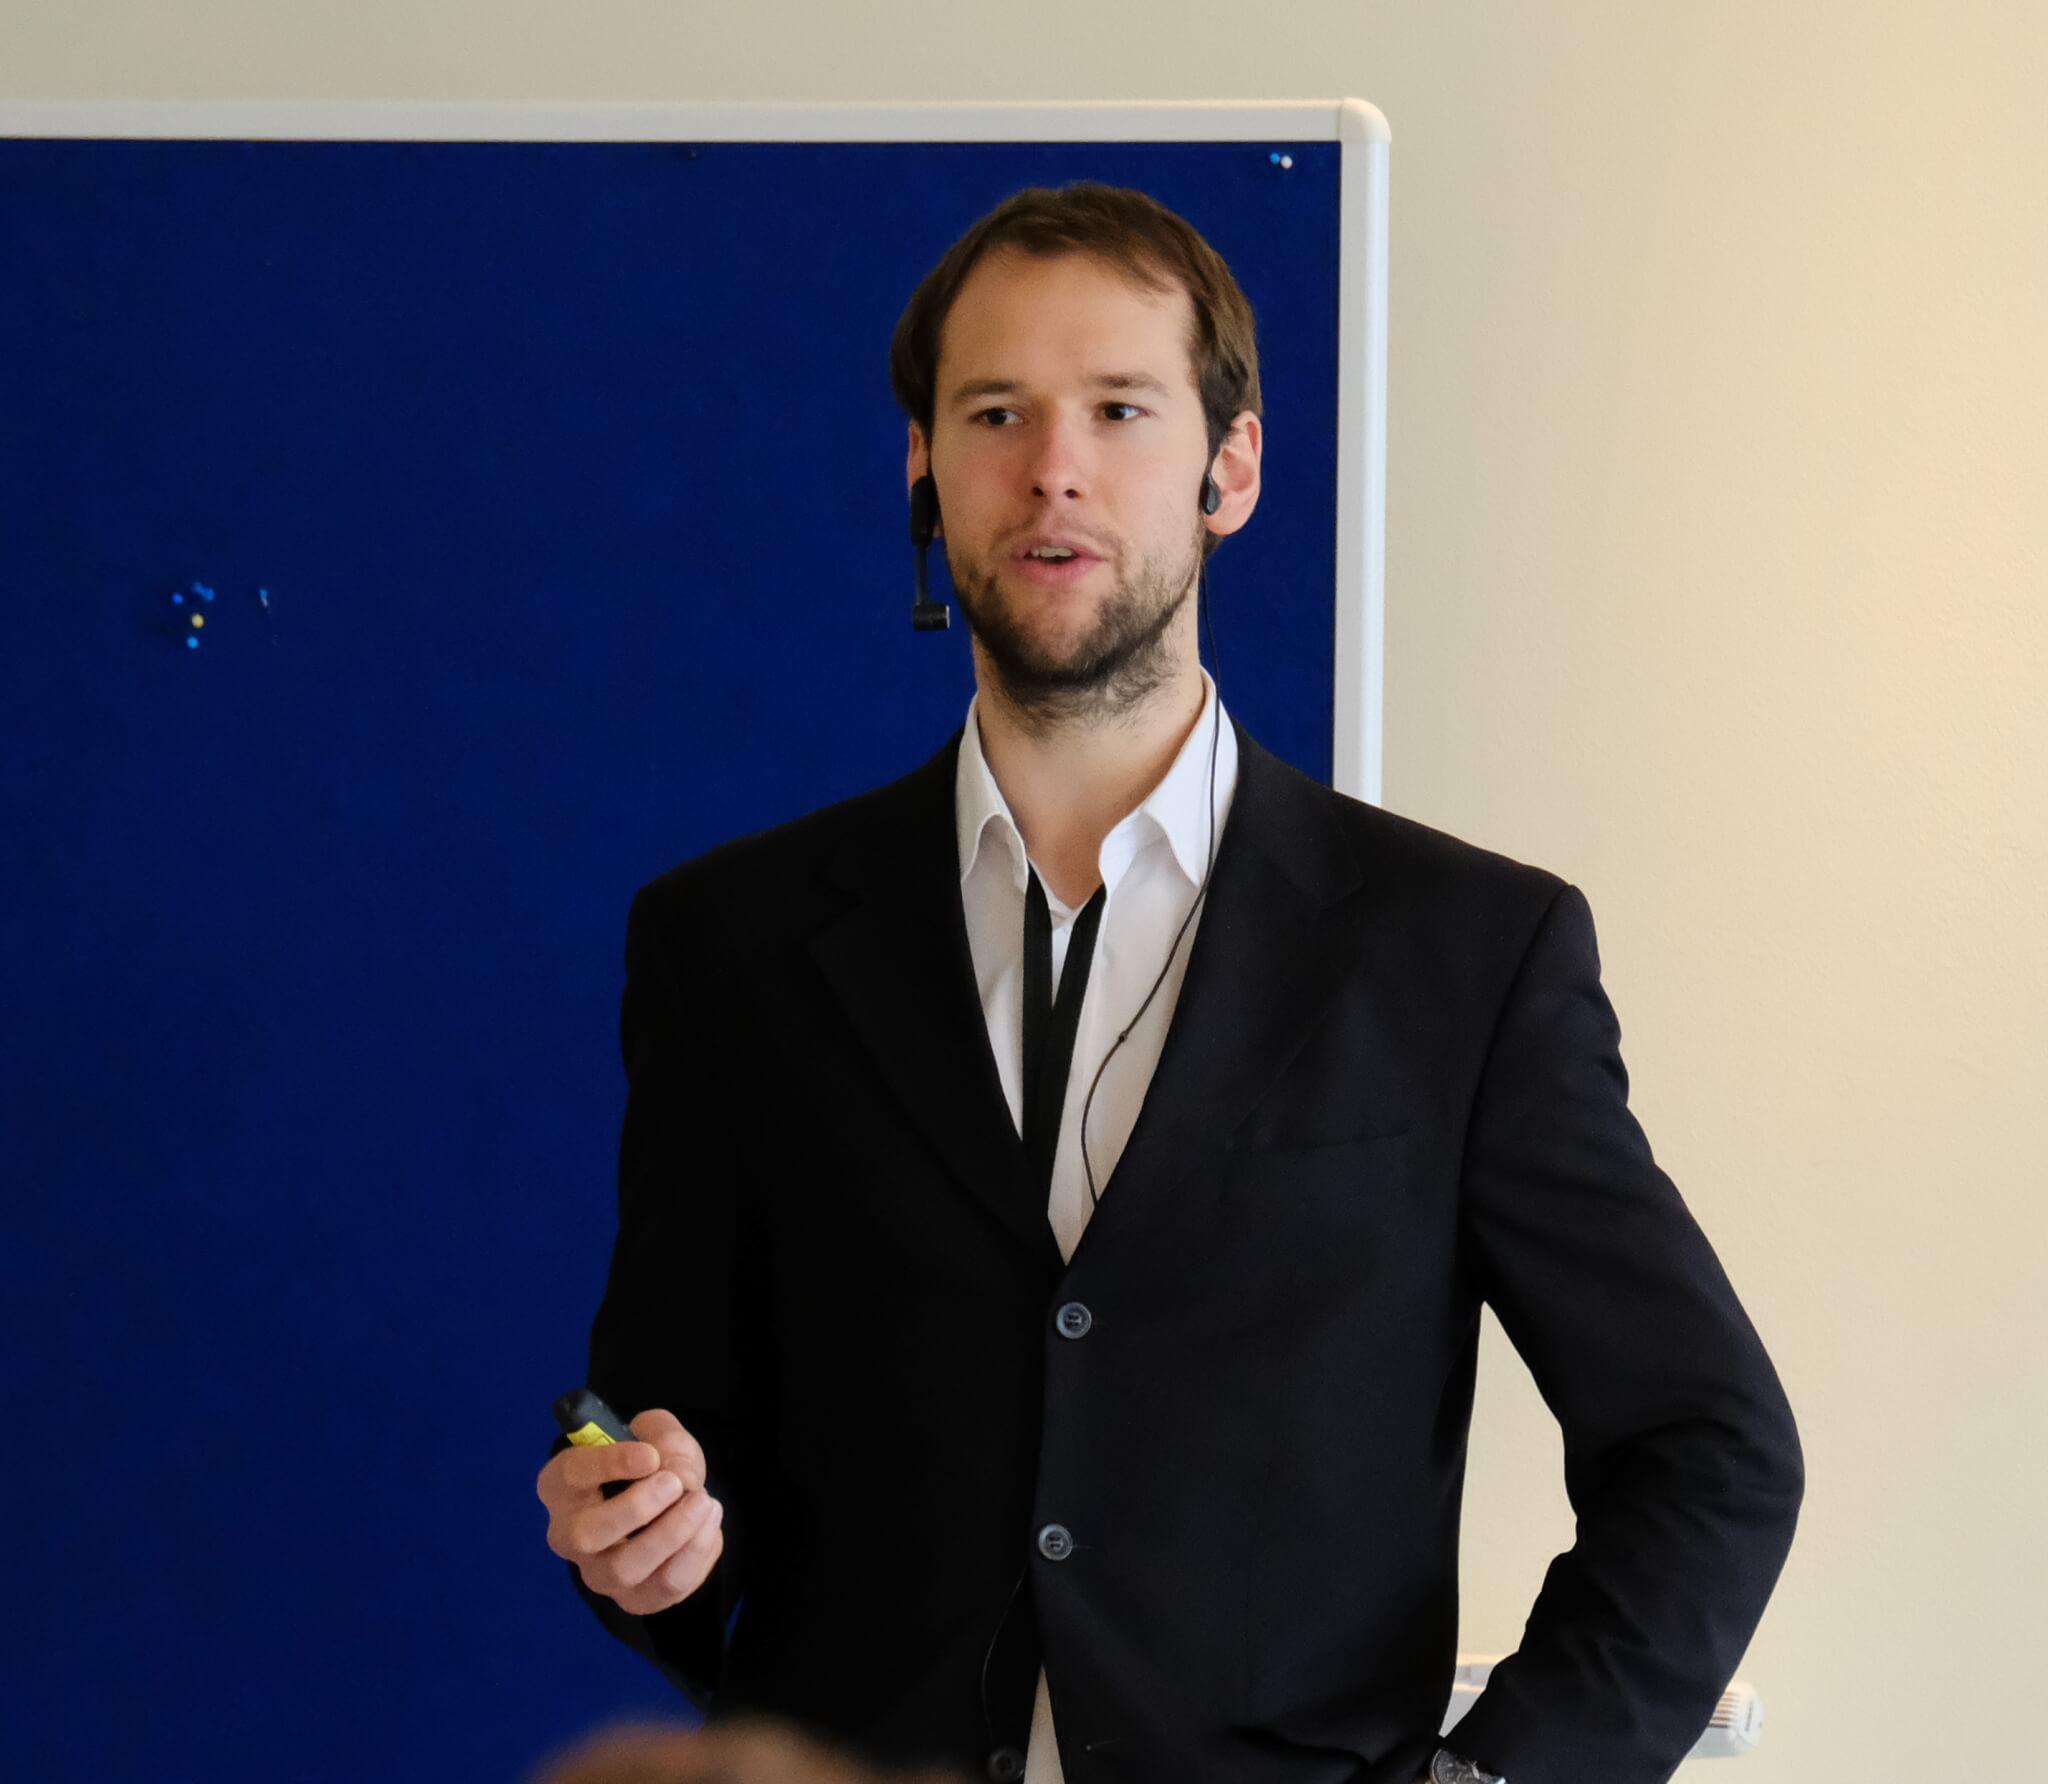 Philippe Preisinger